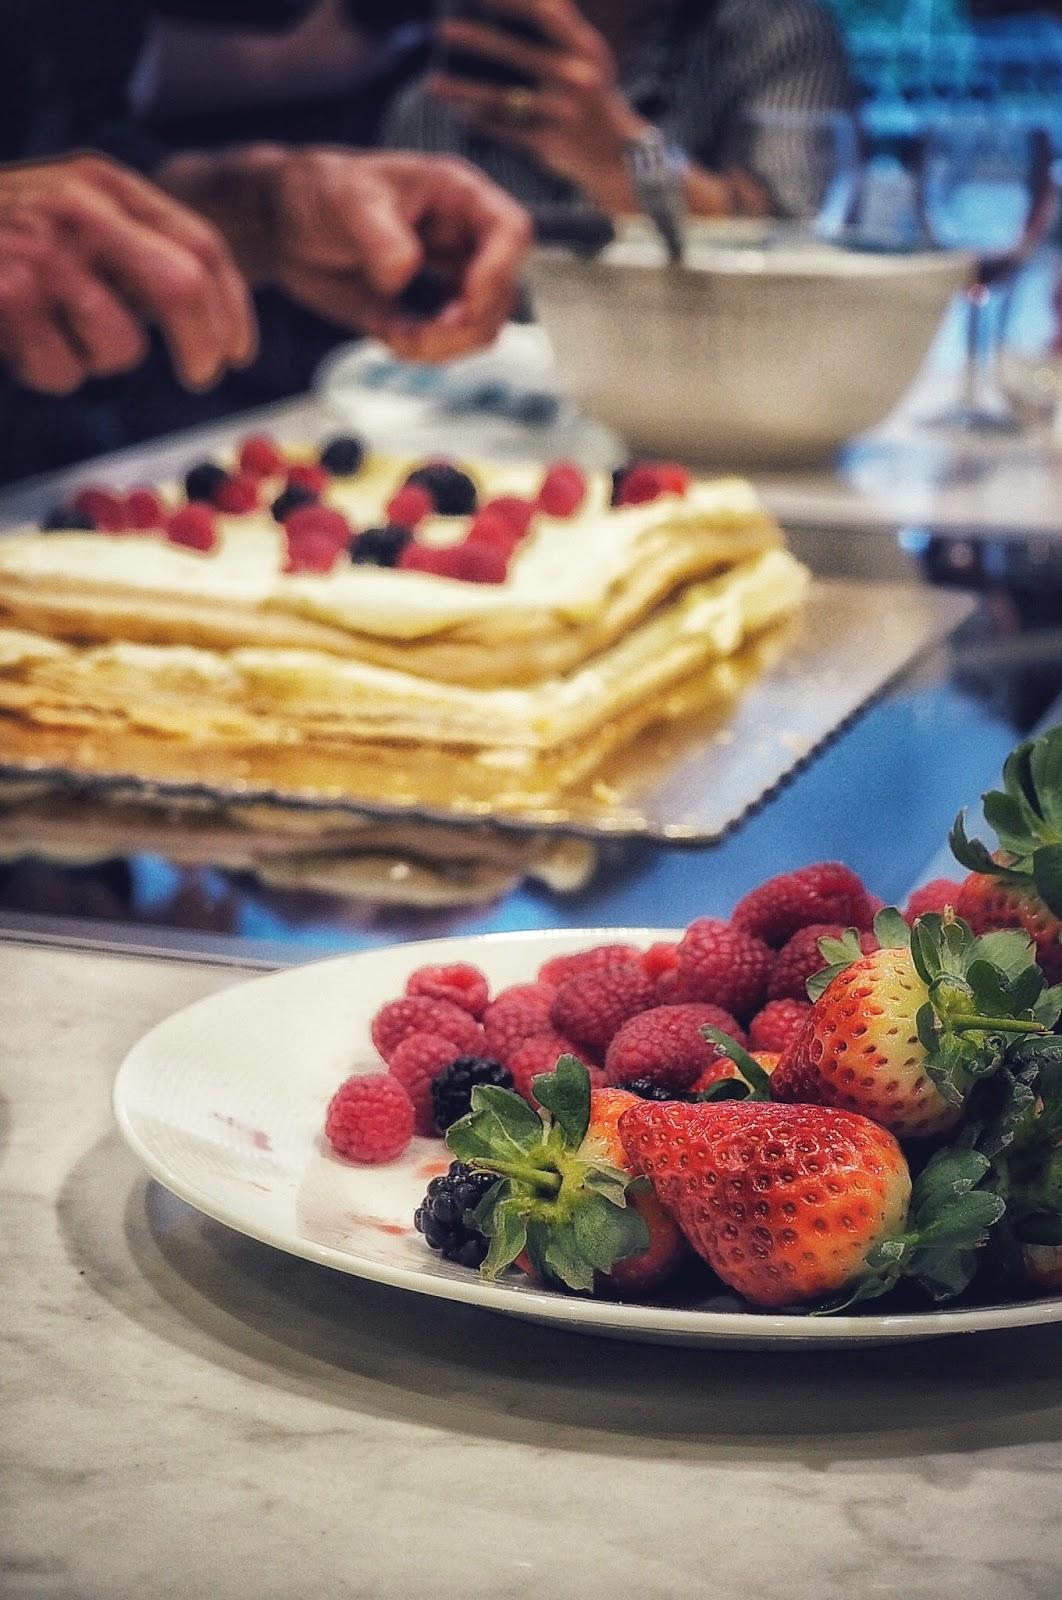 Fruit topped Italian wedding cake